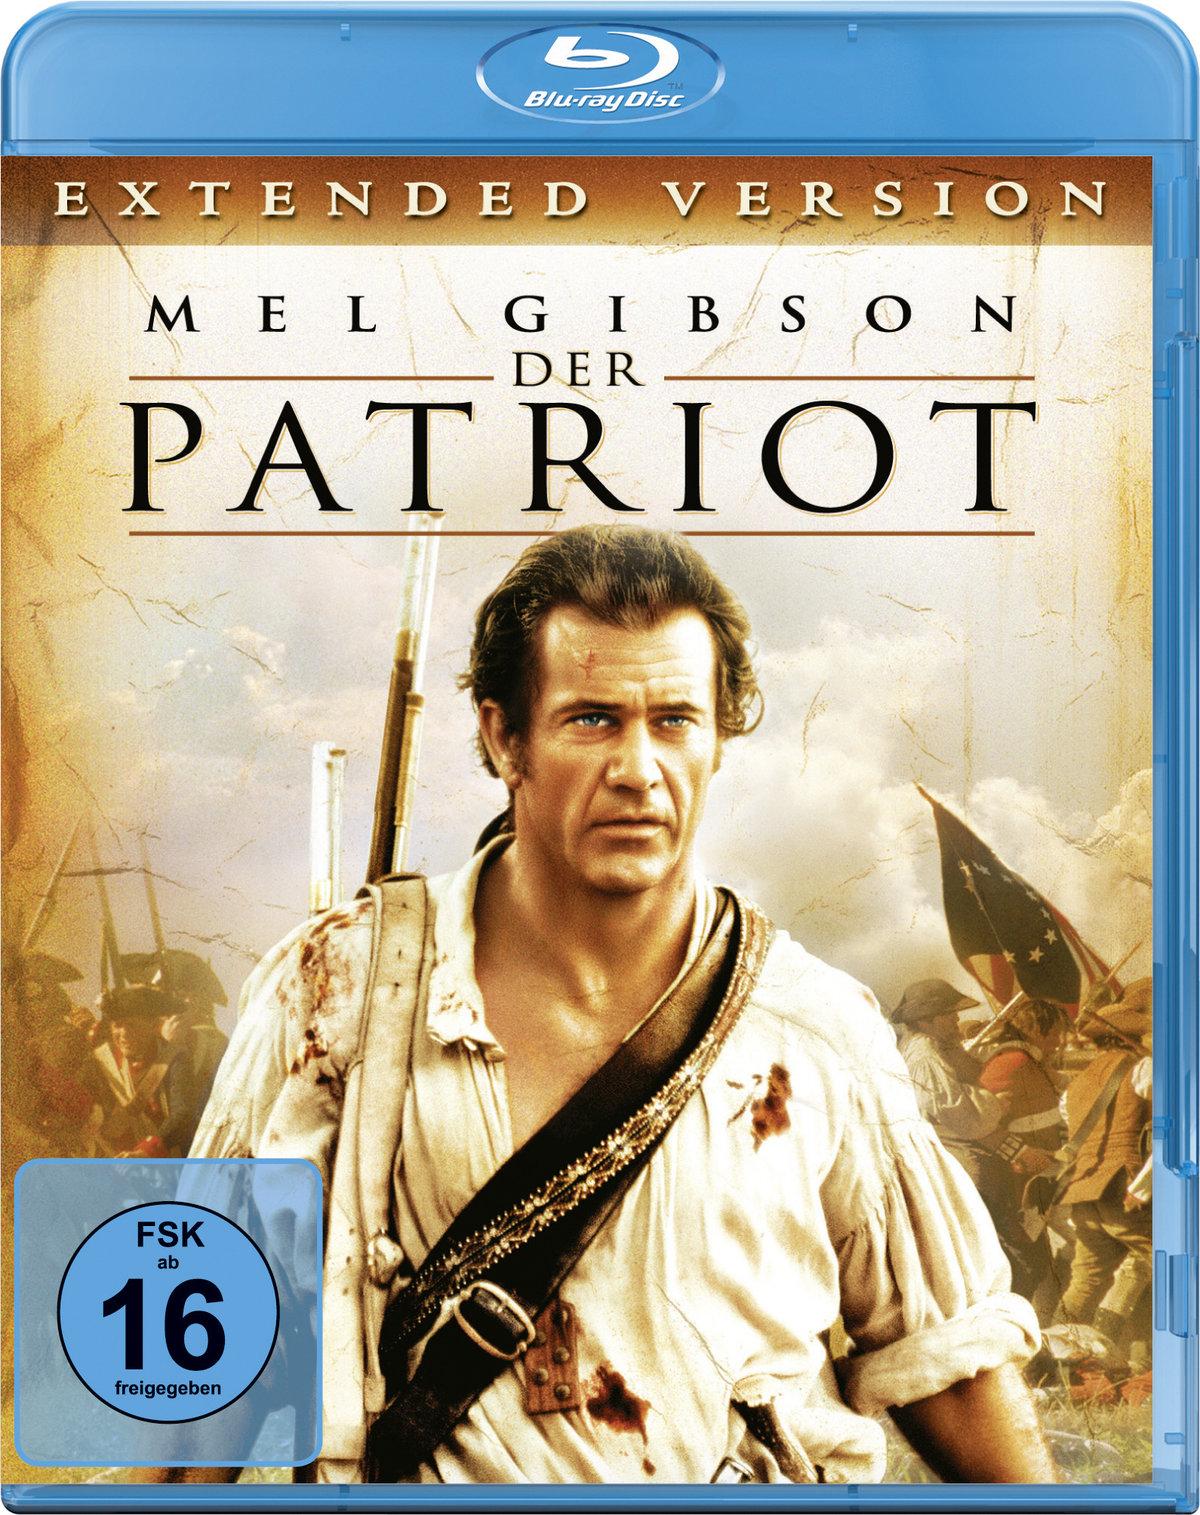 Der Patriot (2000) - (Extended Edition)